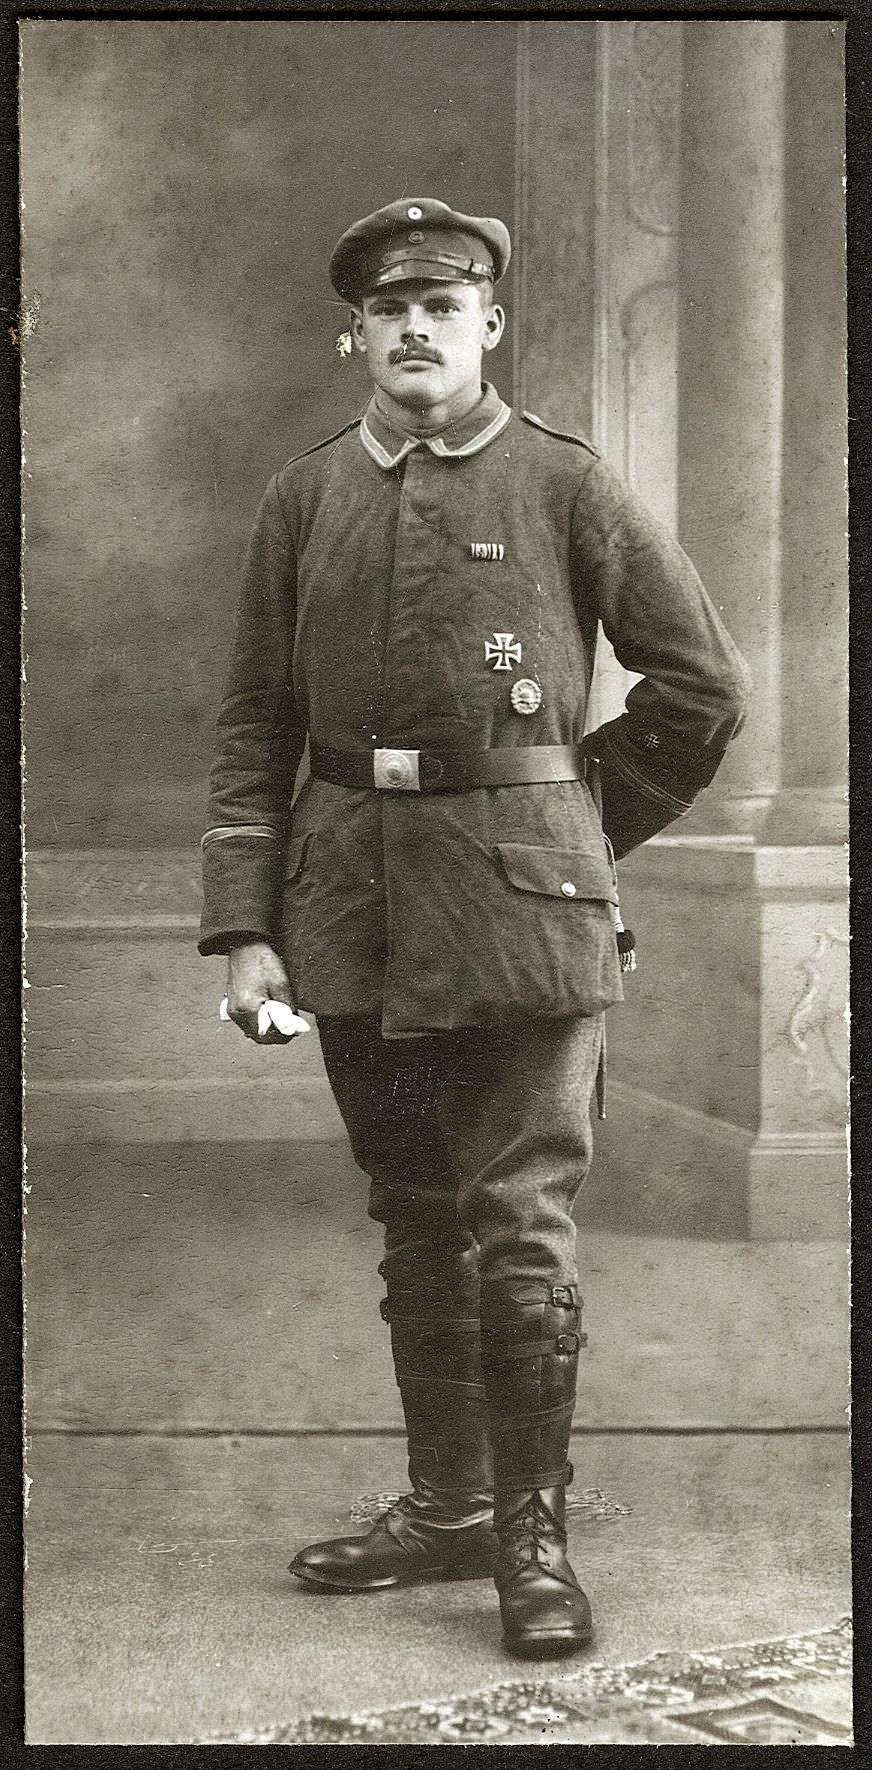 Birk, Gustav, Bild 1